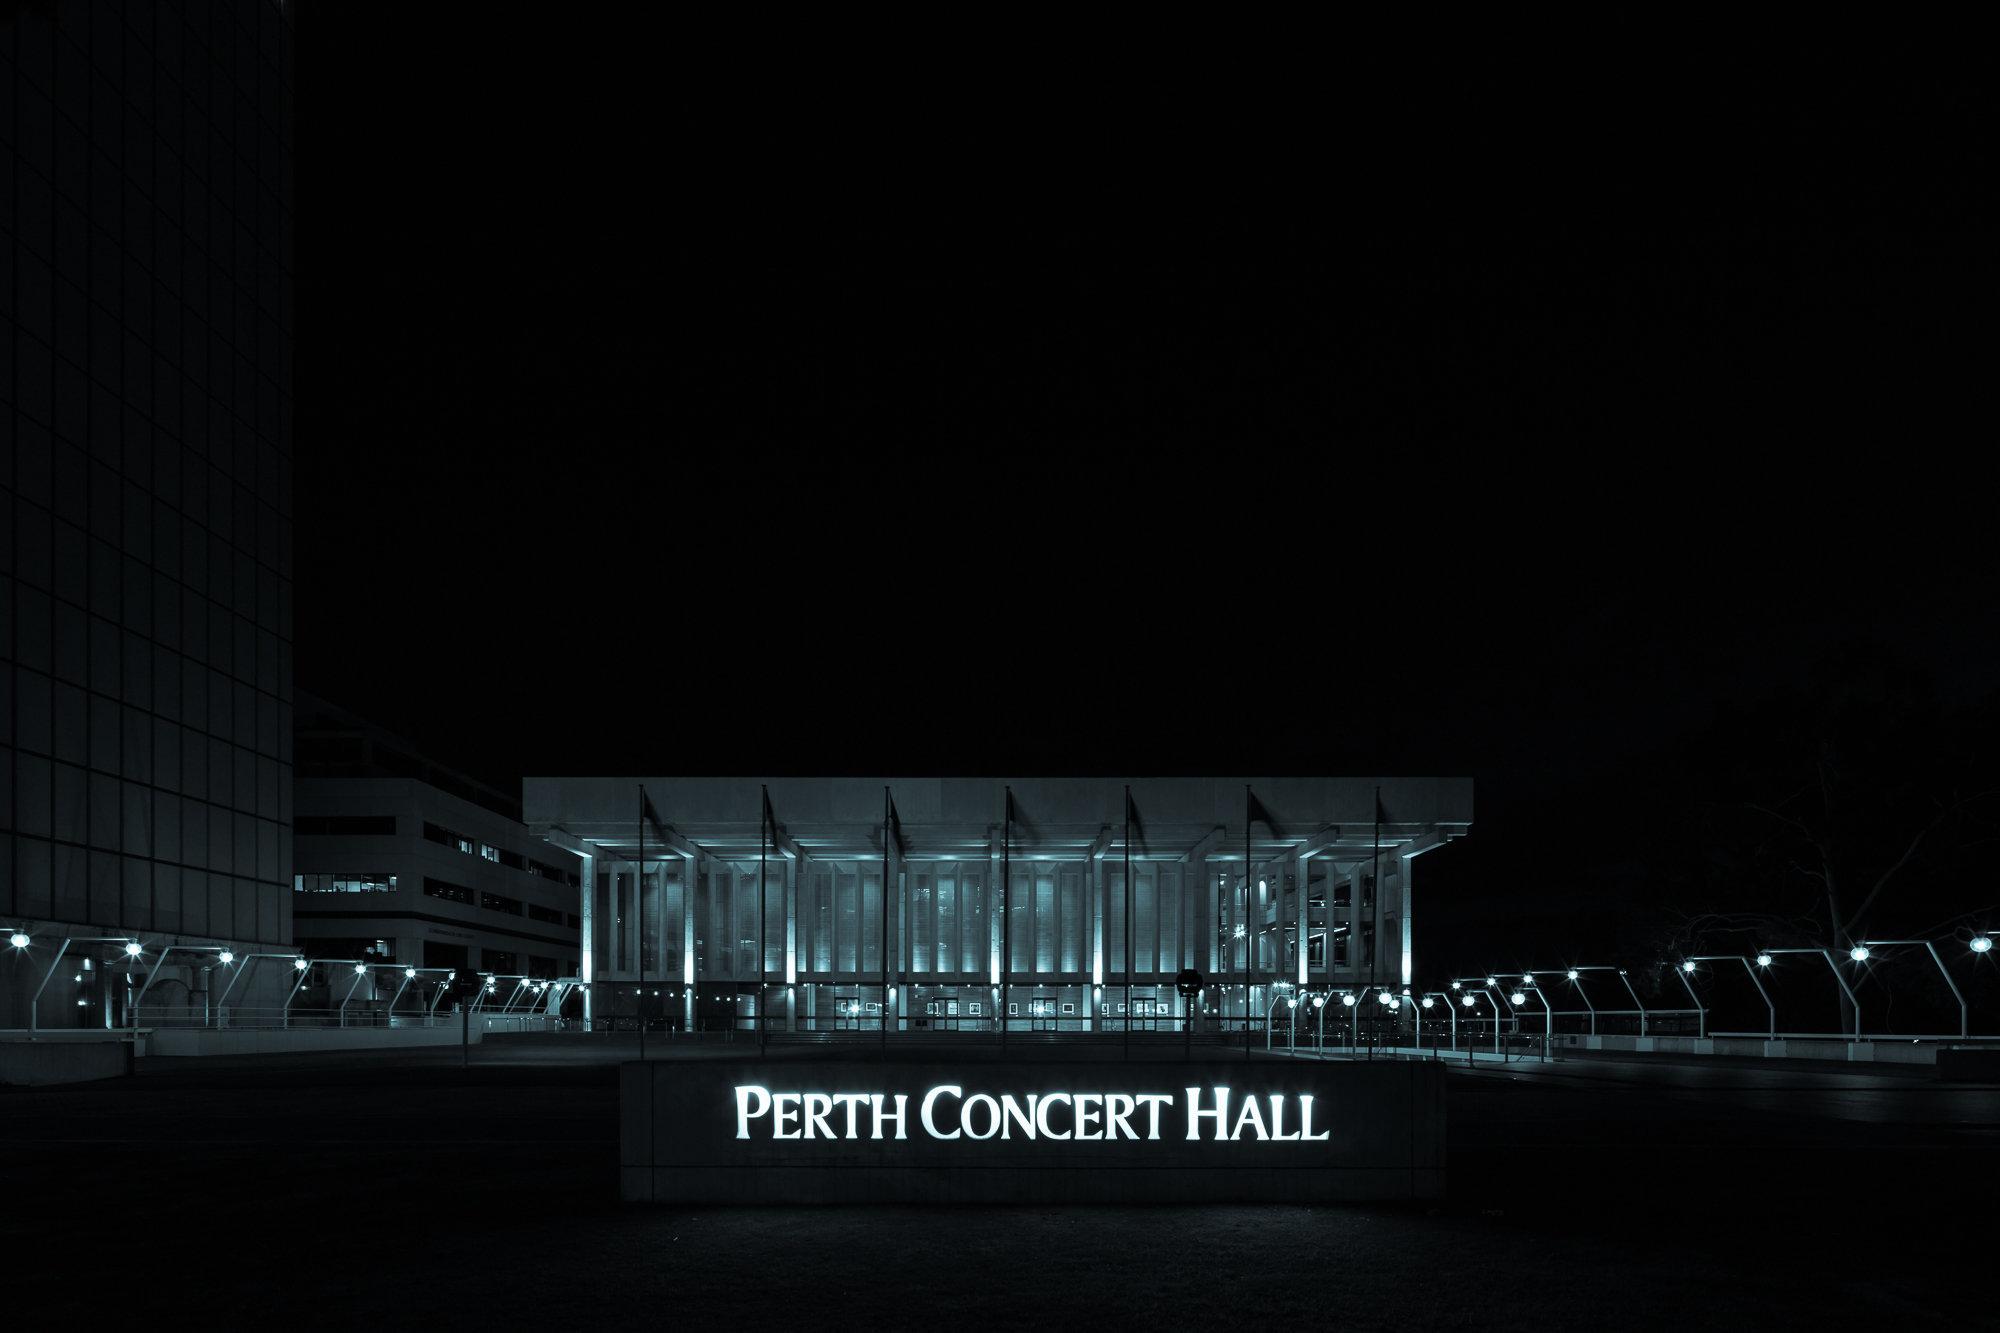 PERTH CONCERT HALL [PERTH]